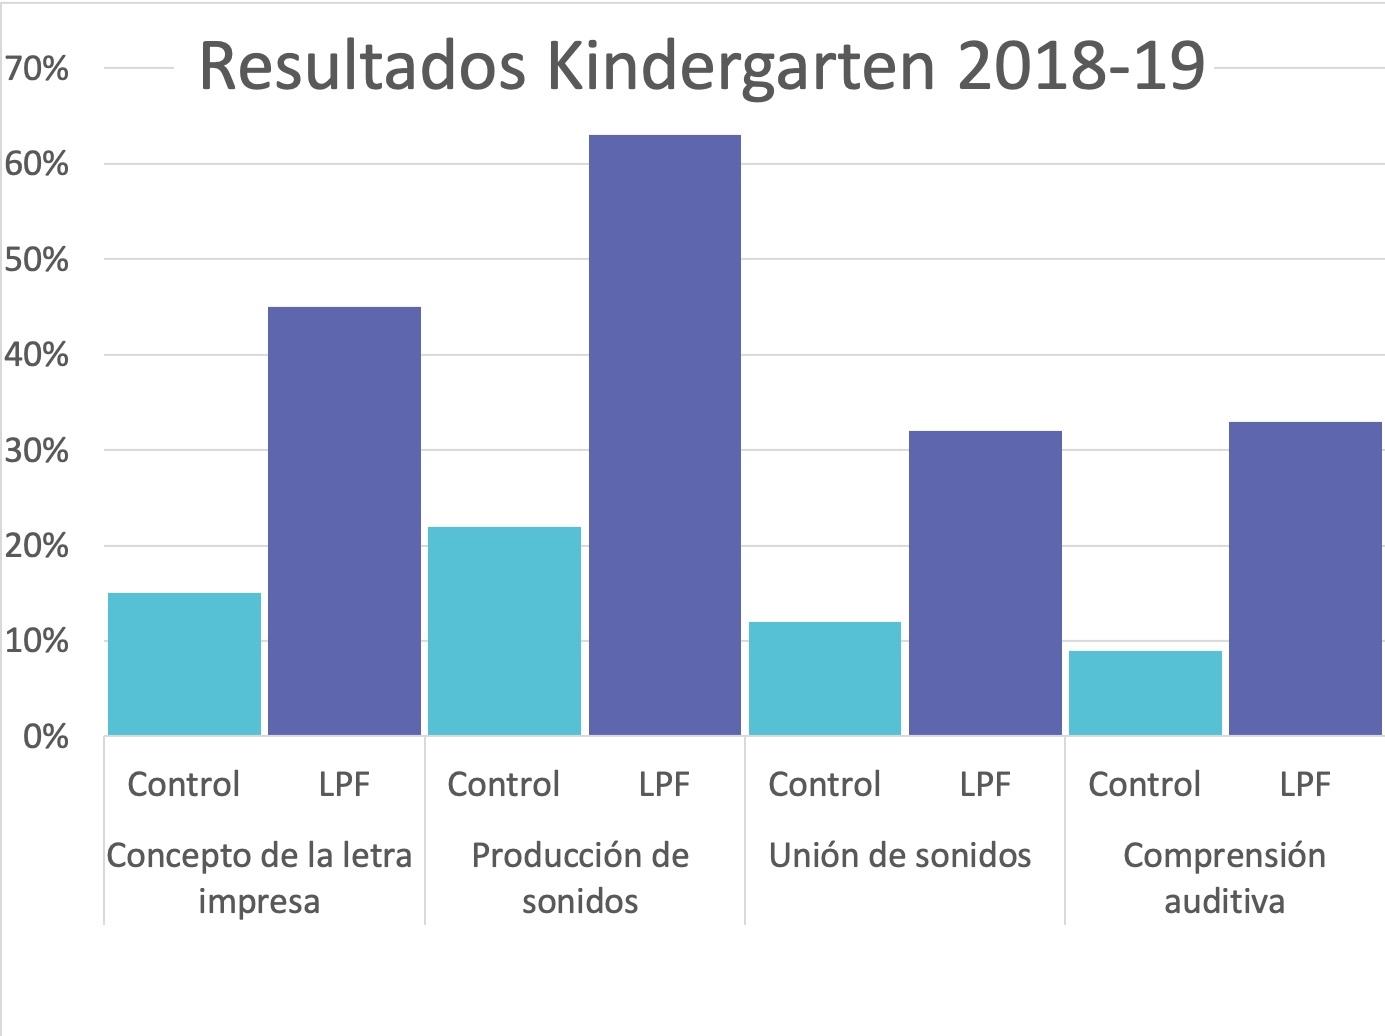 kinder+resultados.jpg